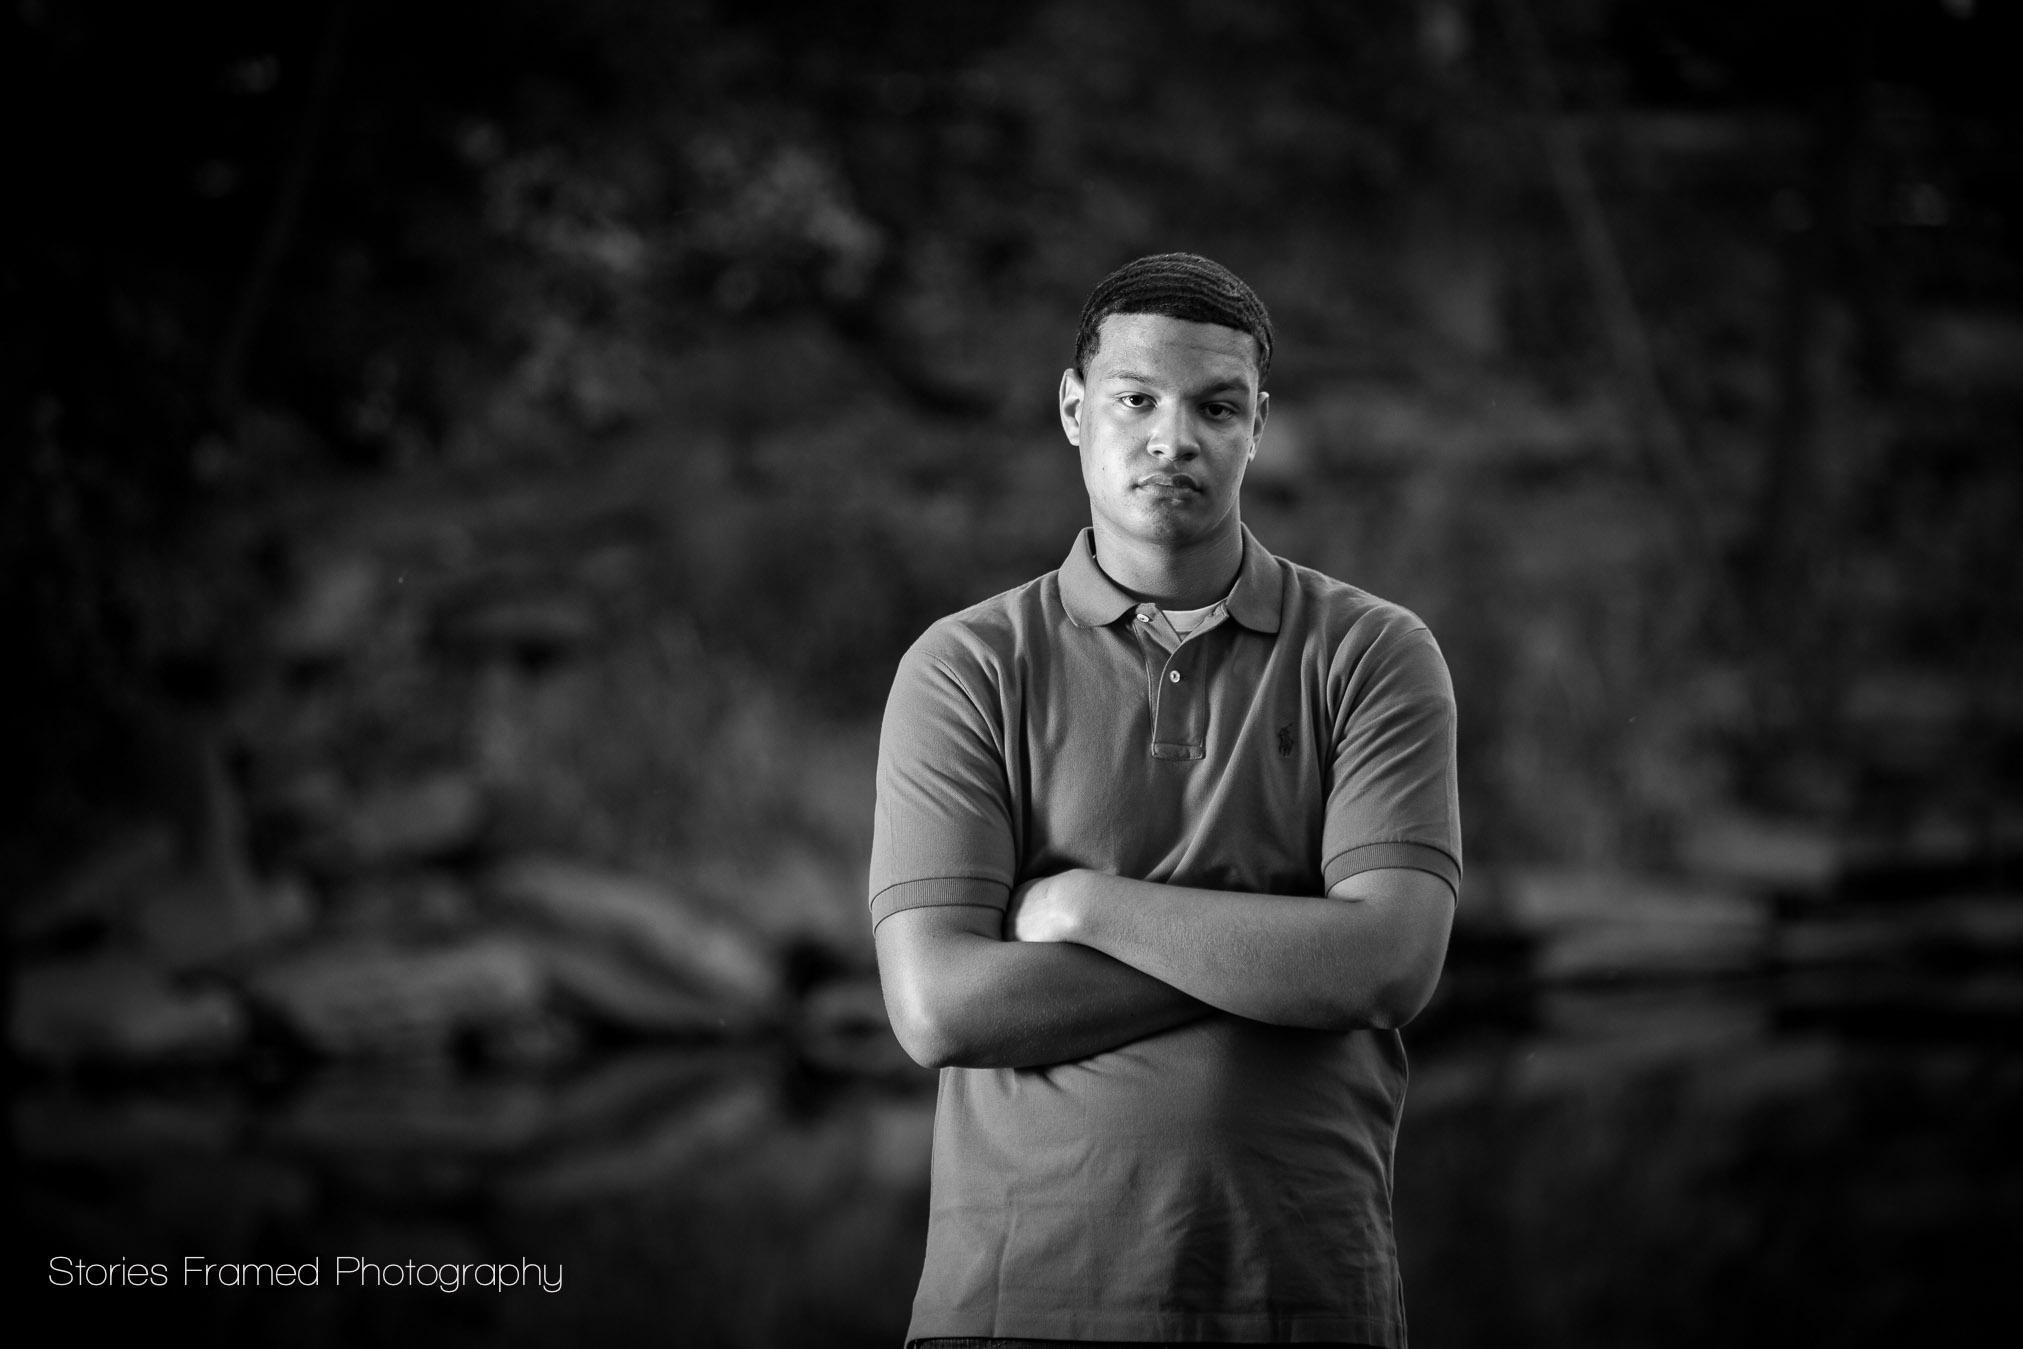 black and white portrait in a river